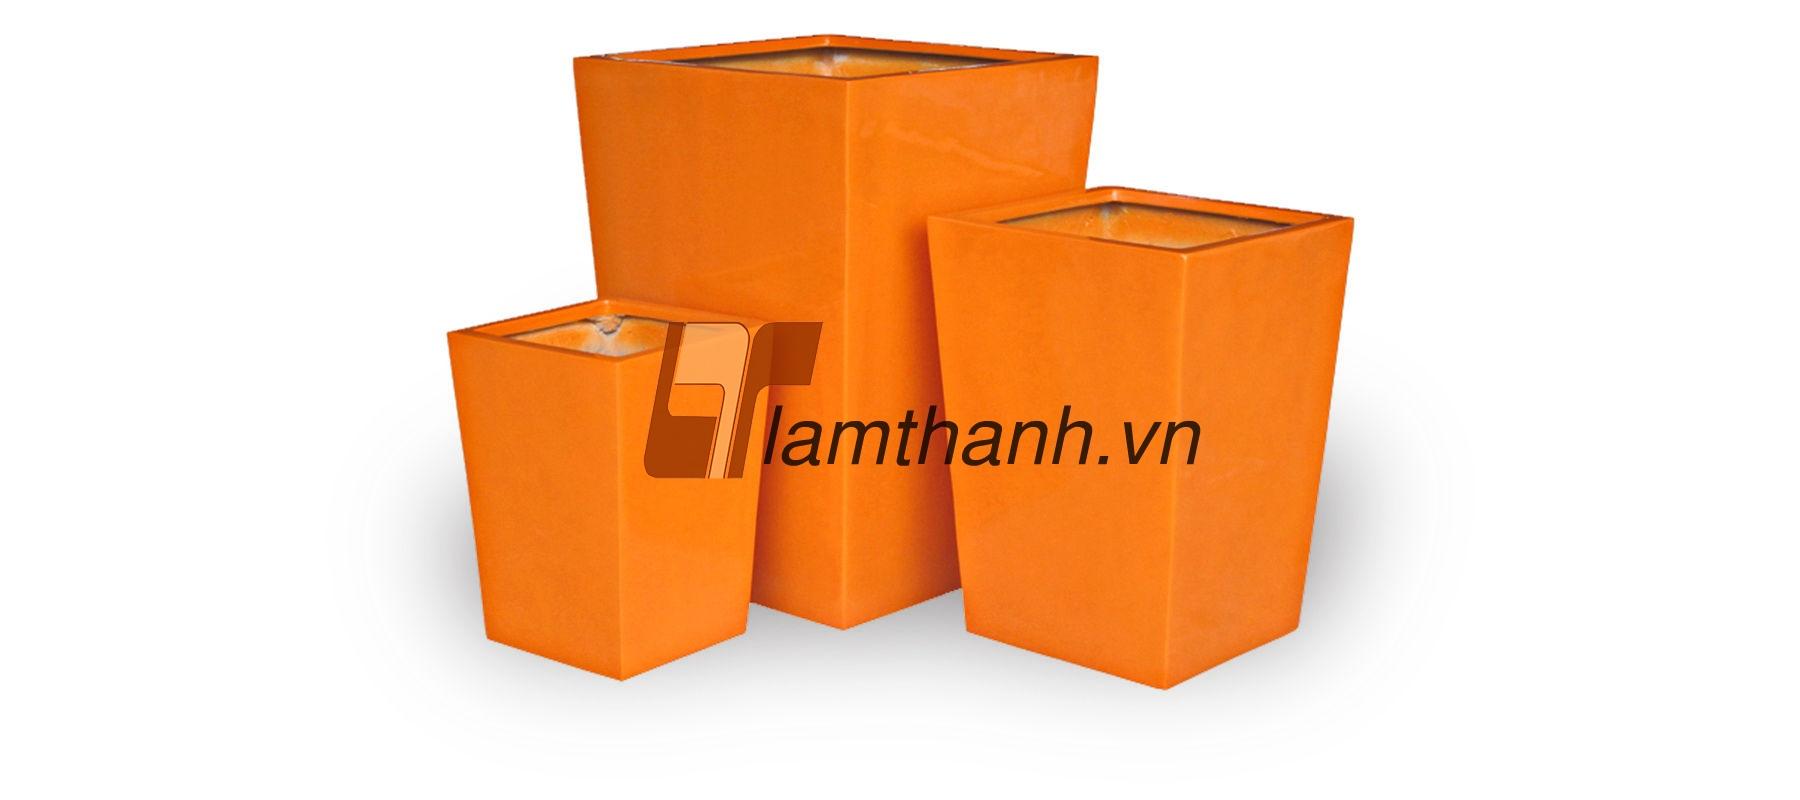 vietnam polystone, fiberglass 02